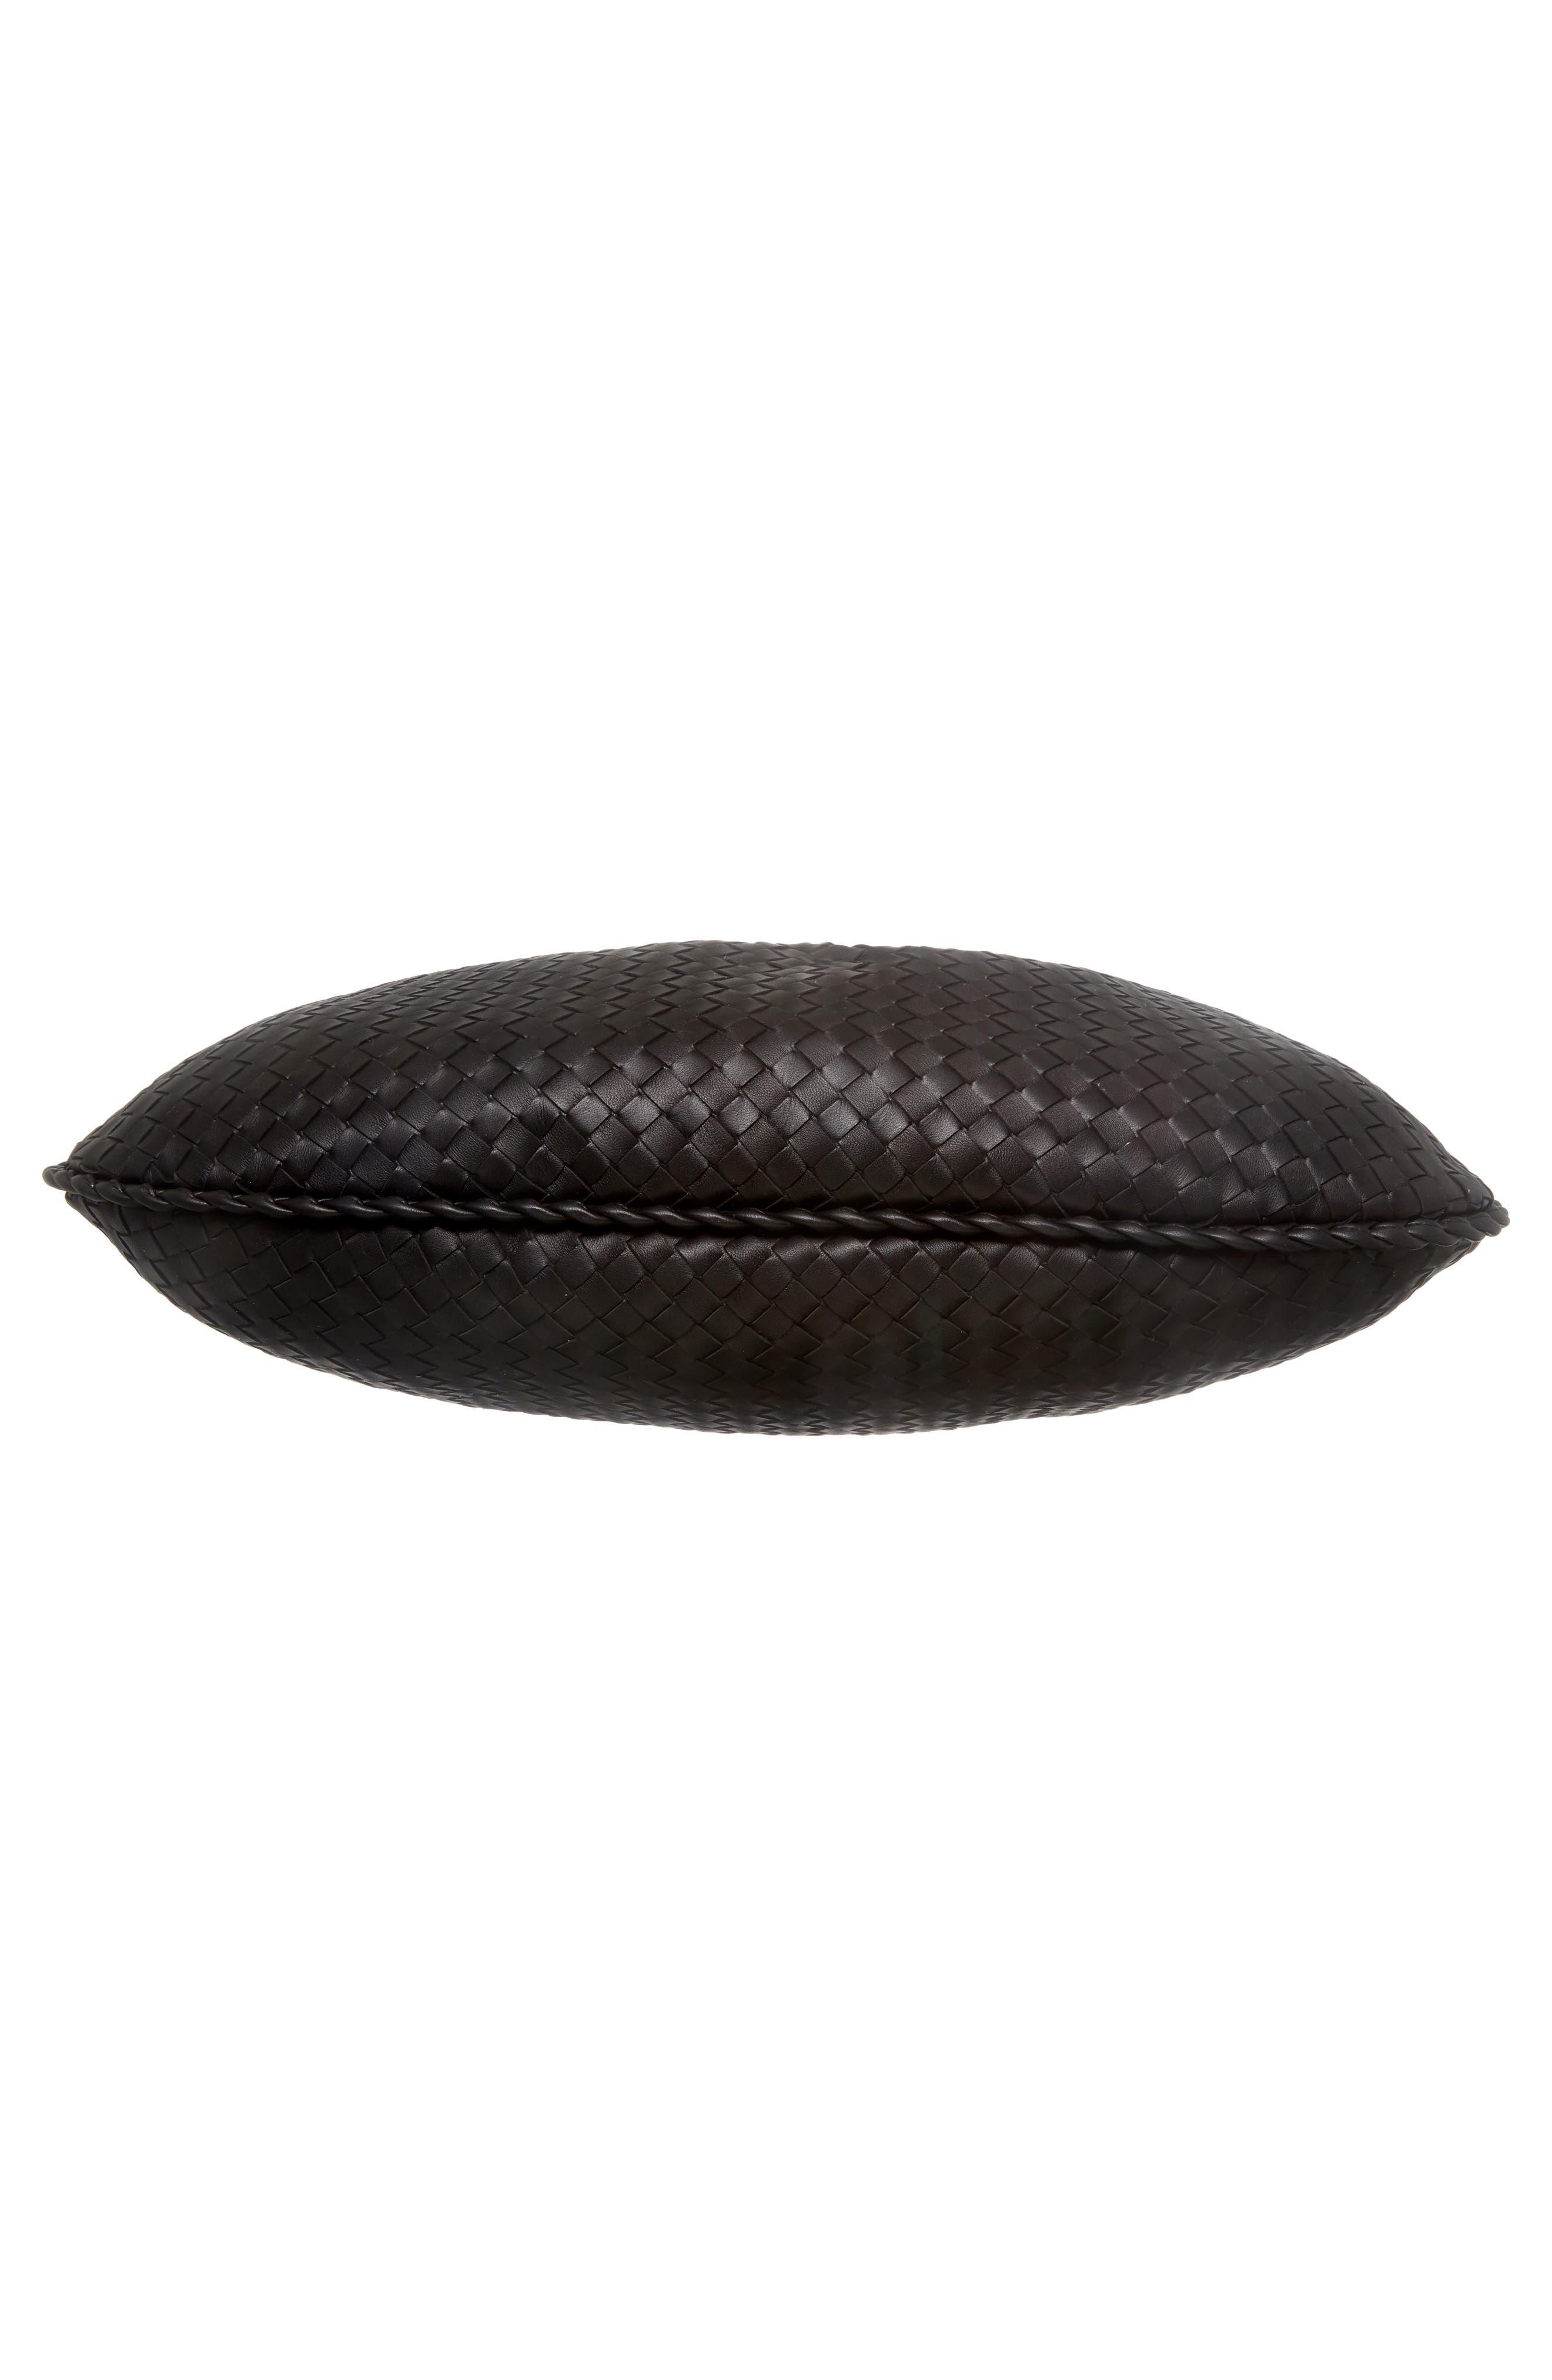 Large Veneta Leather Hobo,                             Alternate thumbnail 6, color,                             8175 NERO